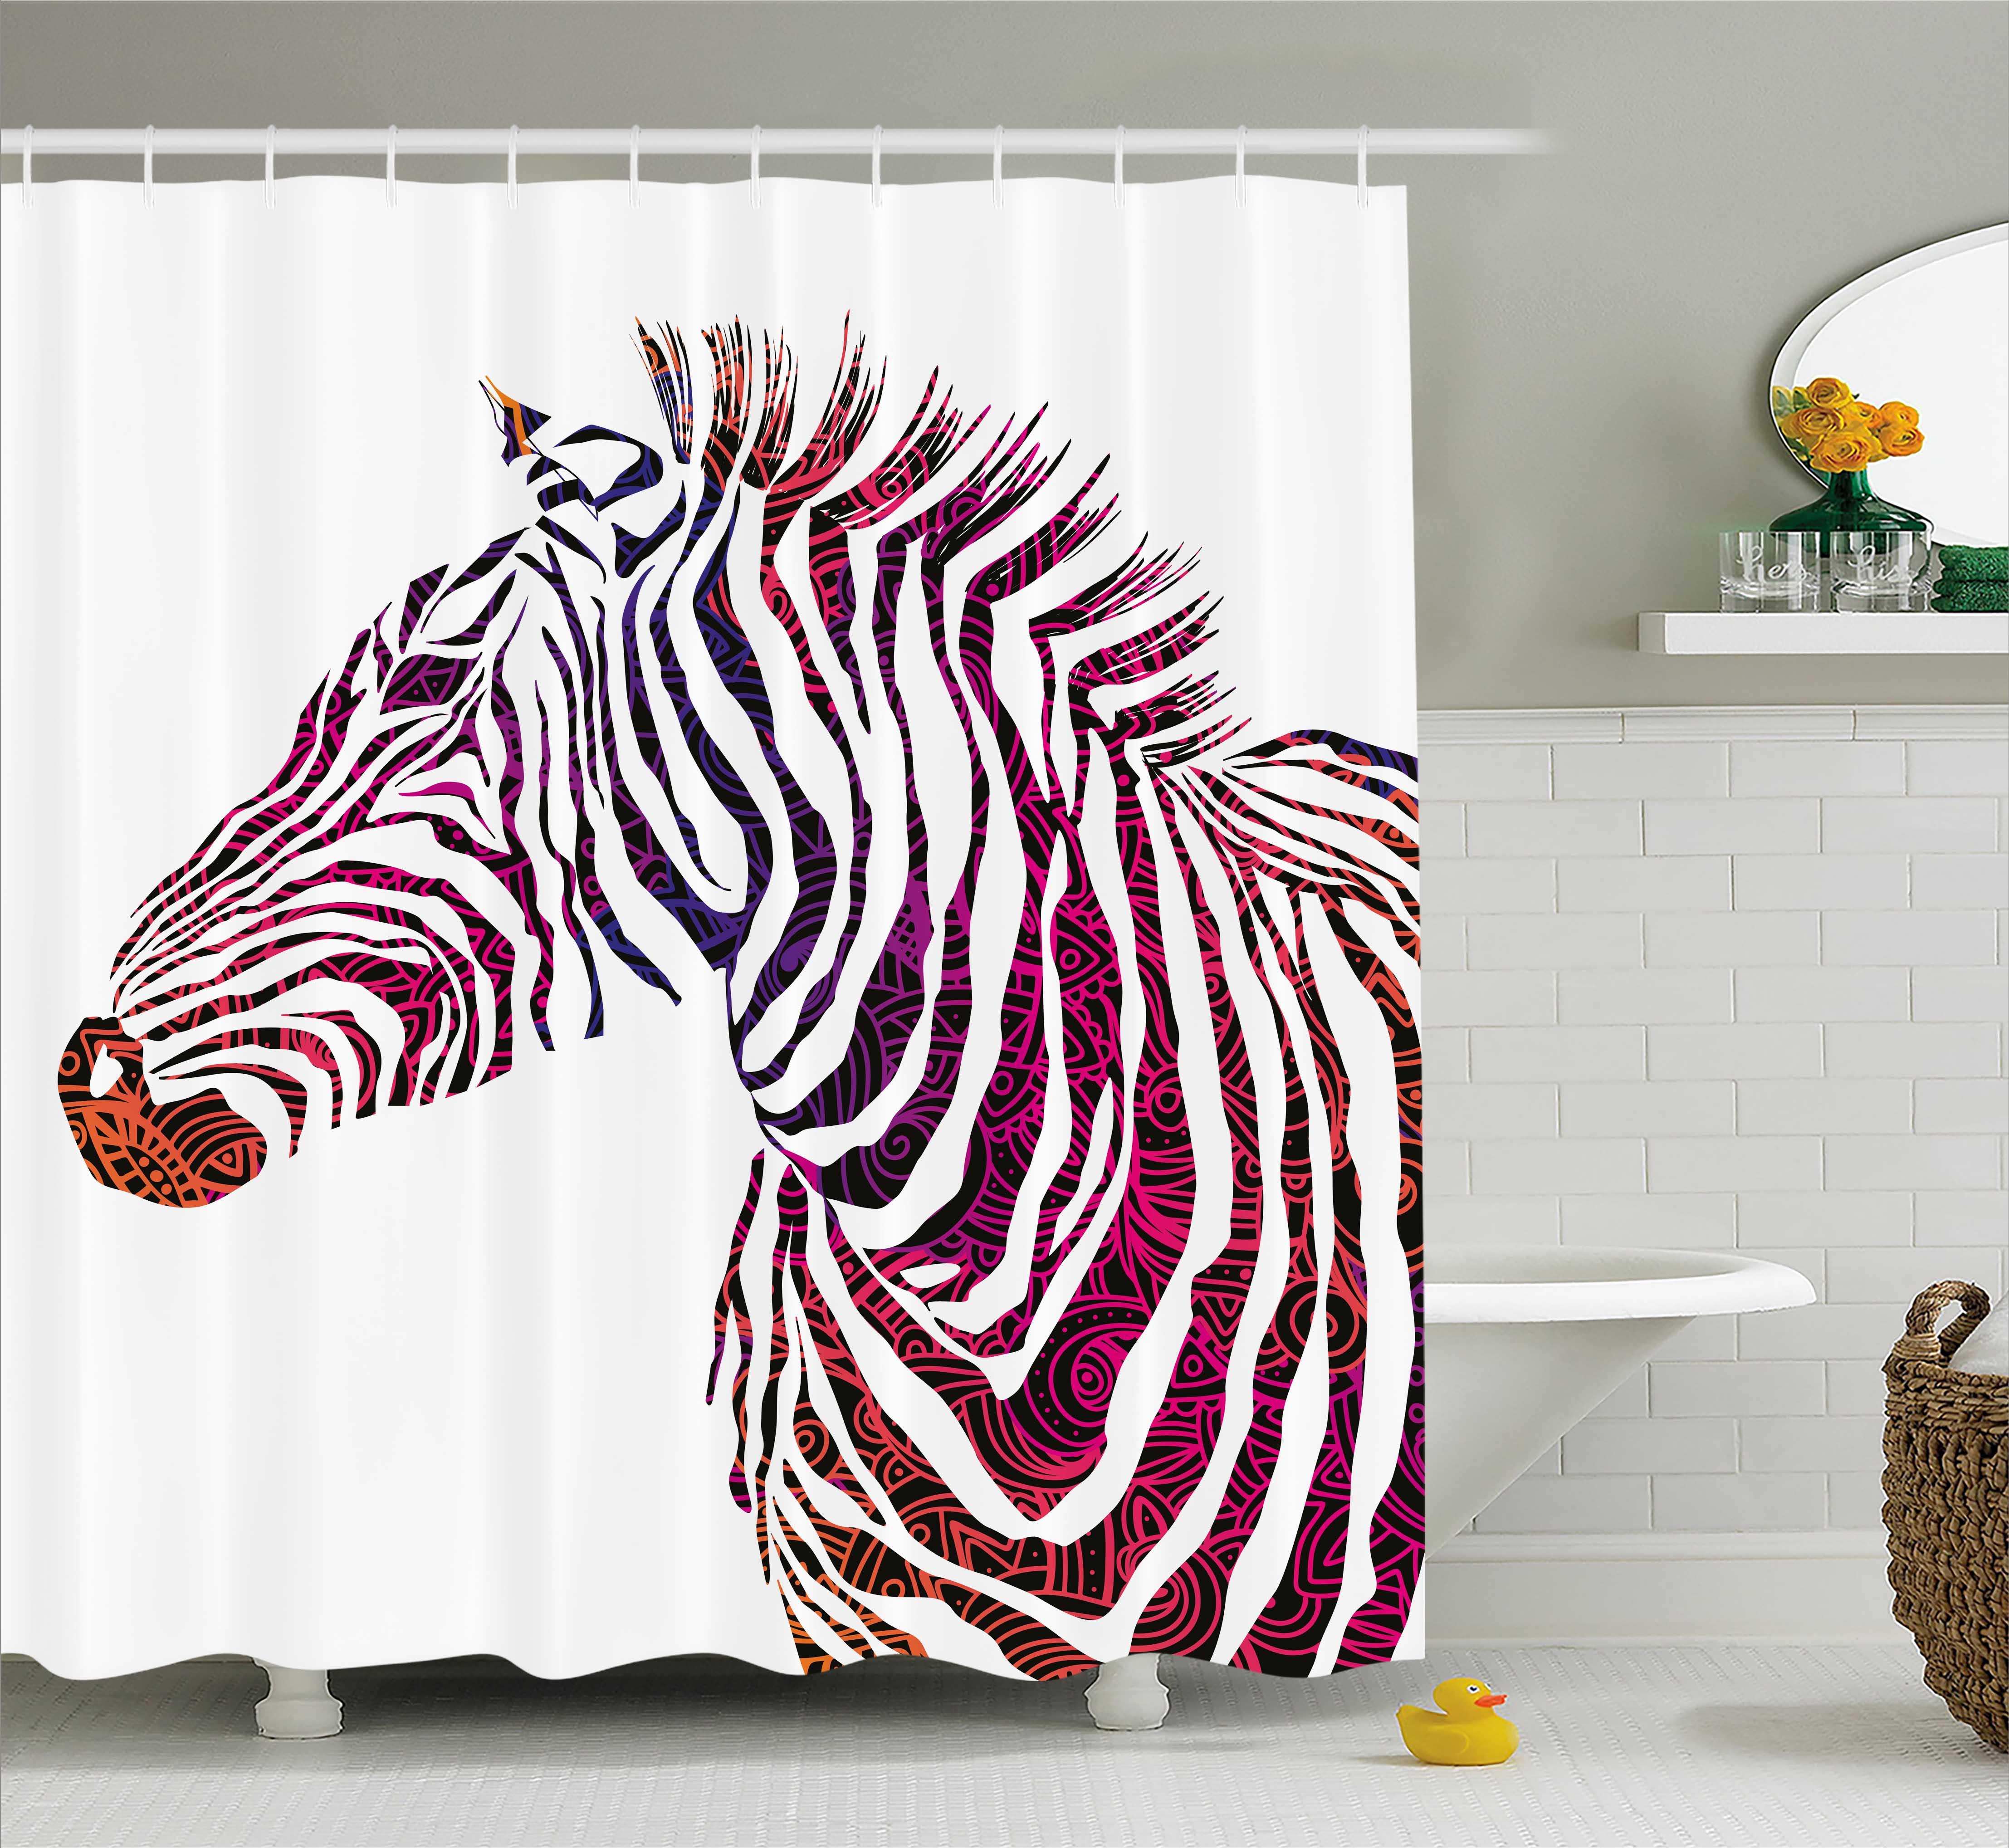 Animal Shower Curtain, Ornamental Zebra Profile Silhouett...